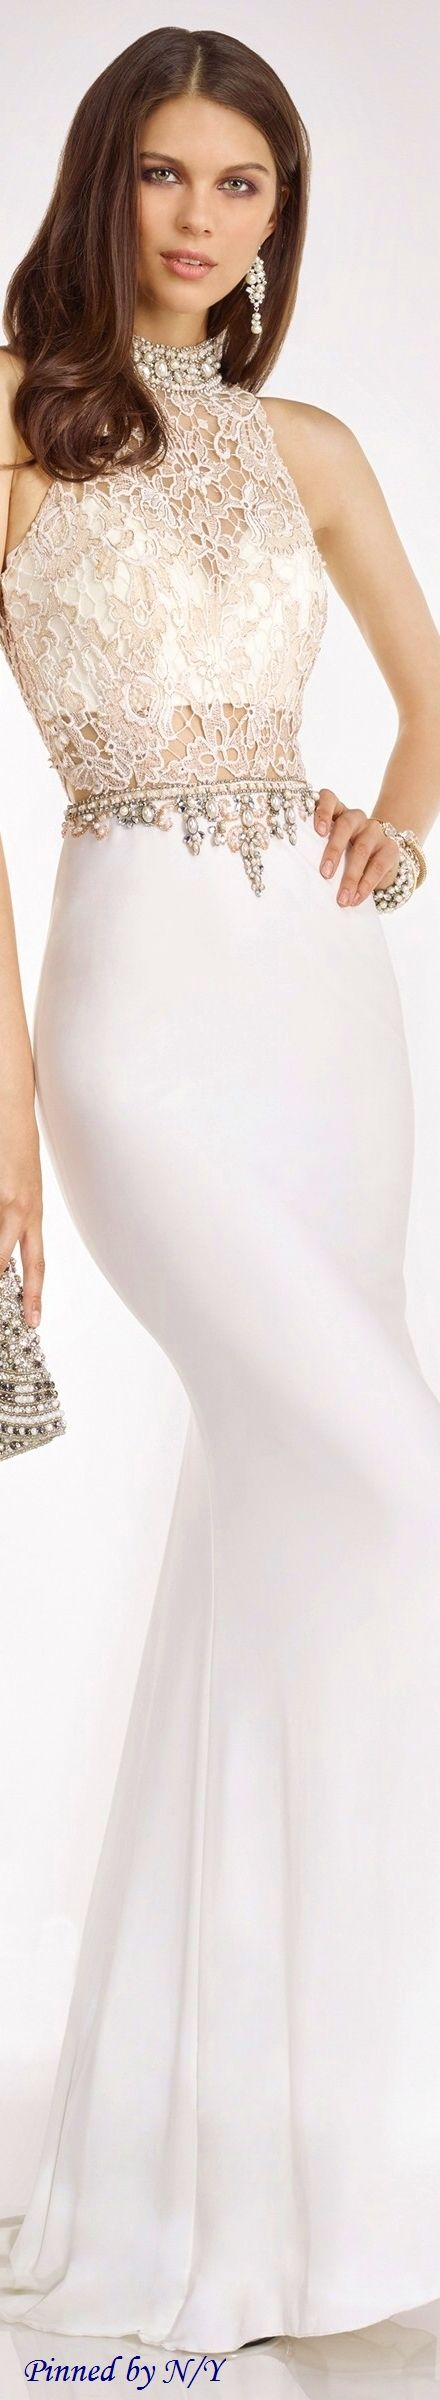 best alyce paris images on pinterest evening gowns formal